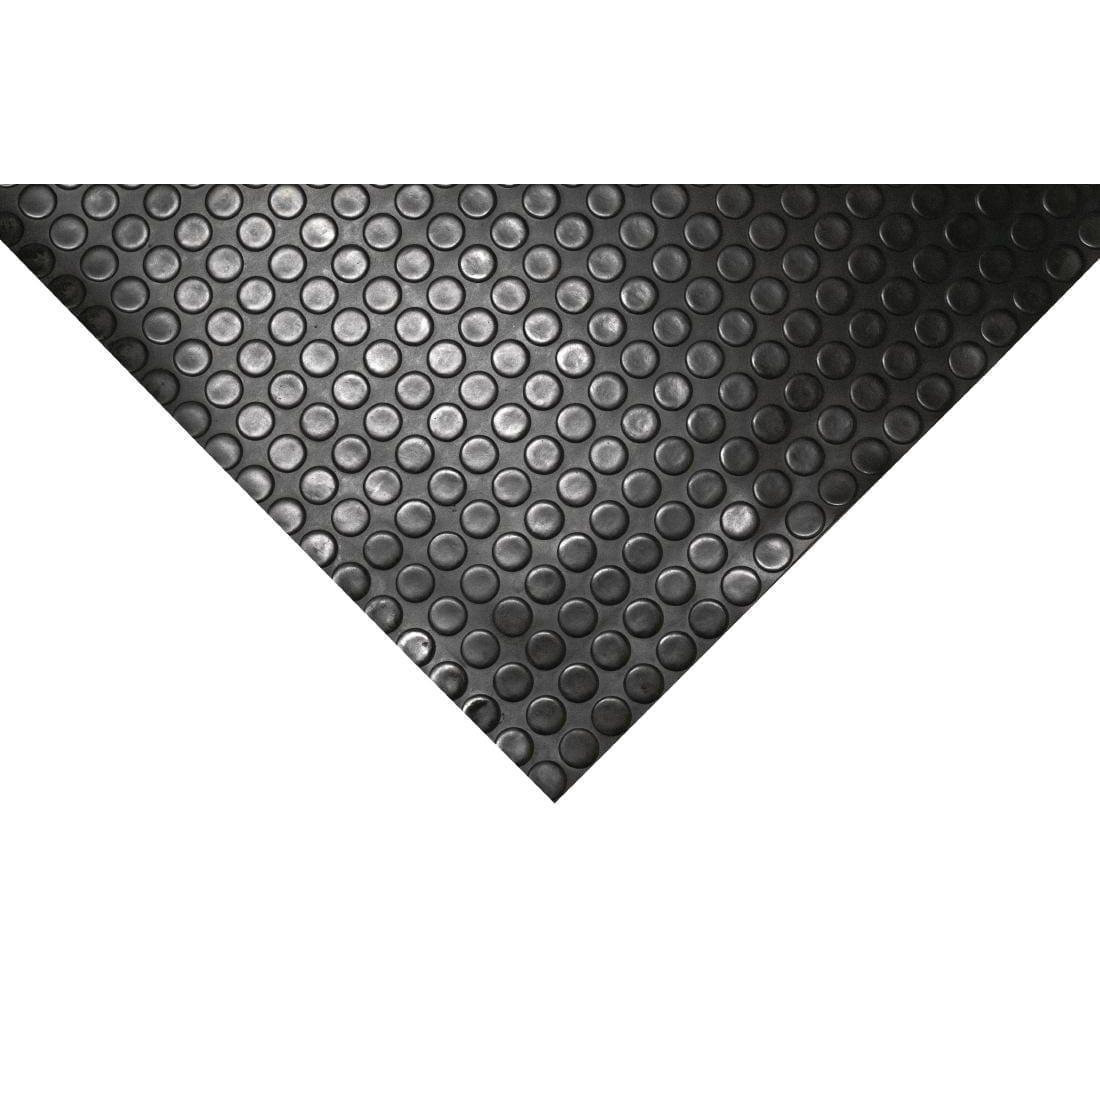 Circular Pattern Rubber Matting (Roll) - 1.2x10m (Direct)-0